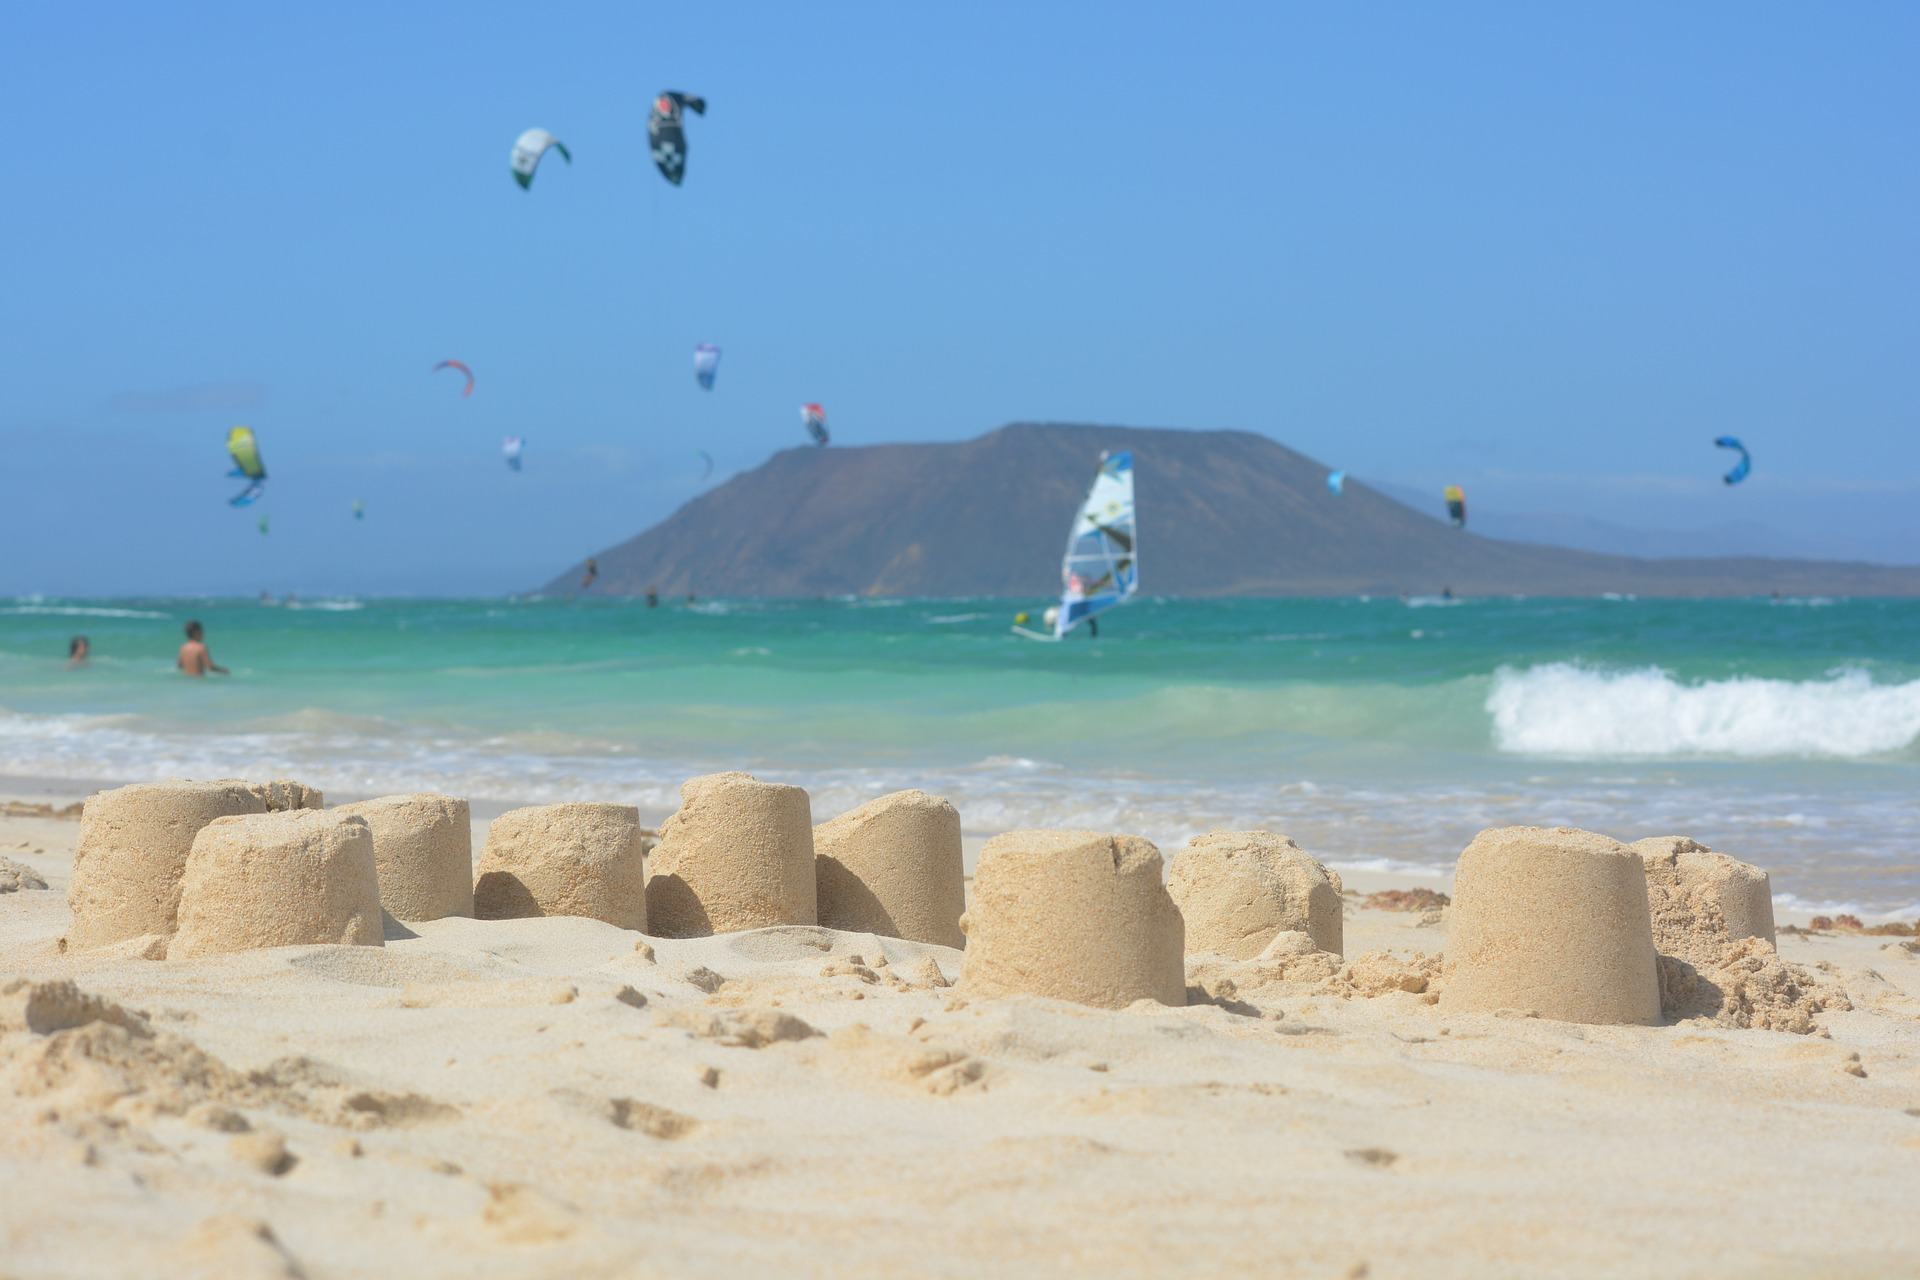 Strand von Corralejo mit Sandburgen und Insel Los Lobos